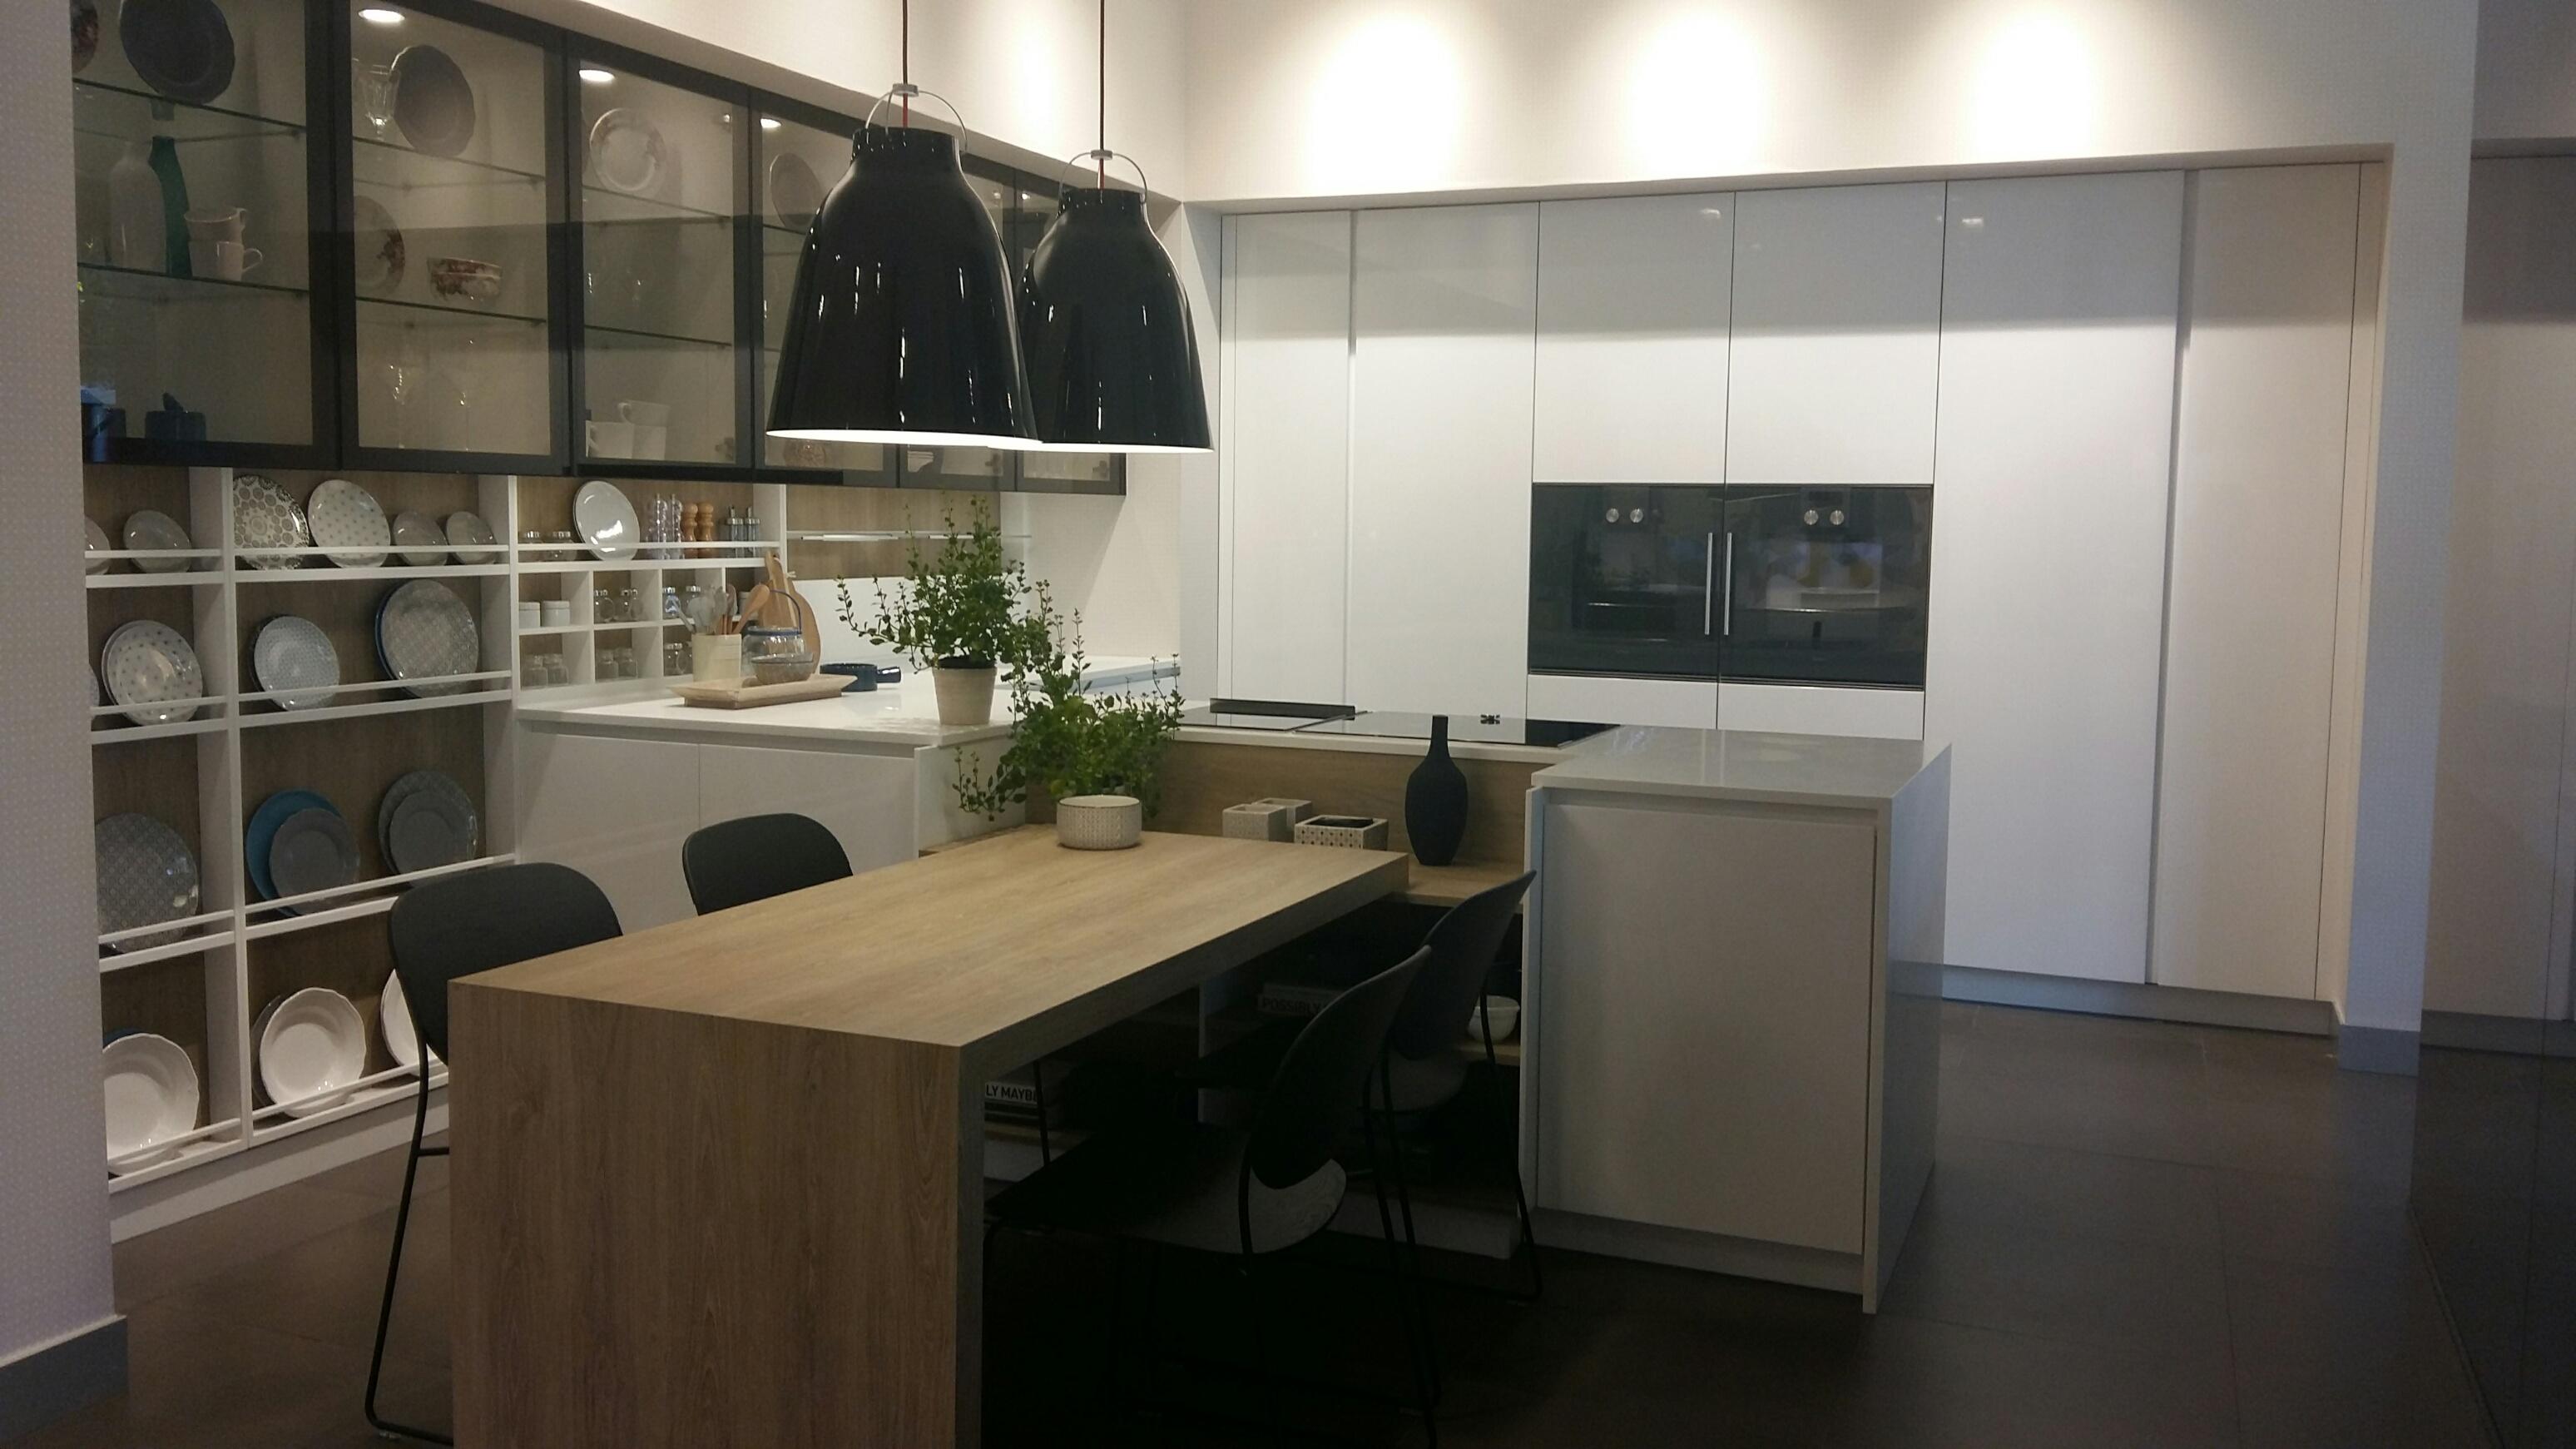 Muebles de cocina bilbao ideas de disenos - Muebles de cocina bilbao ...